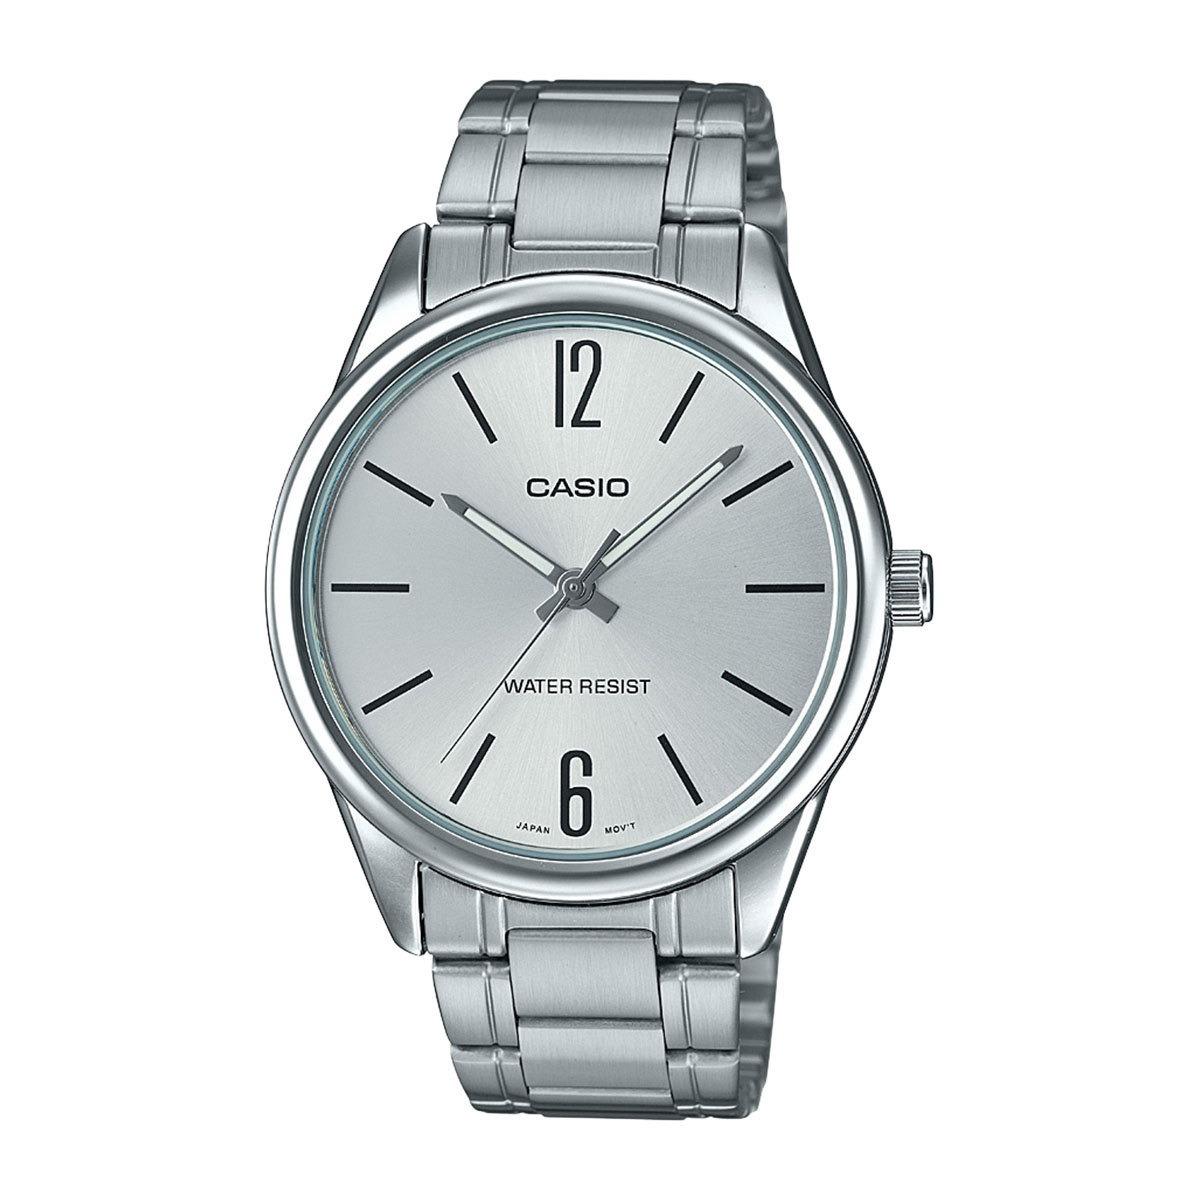 61d87750924 relógio casio collection masculino prata analógico mtp-v005d. Carregando  zoom.